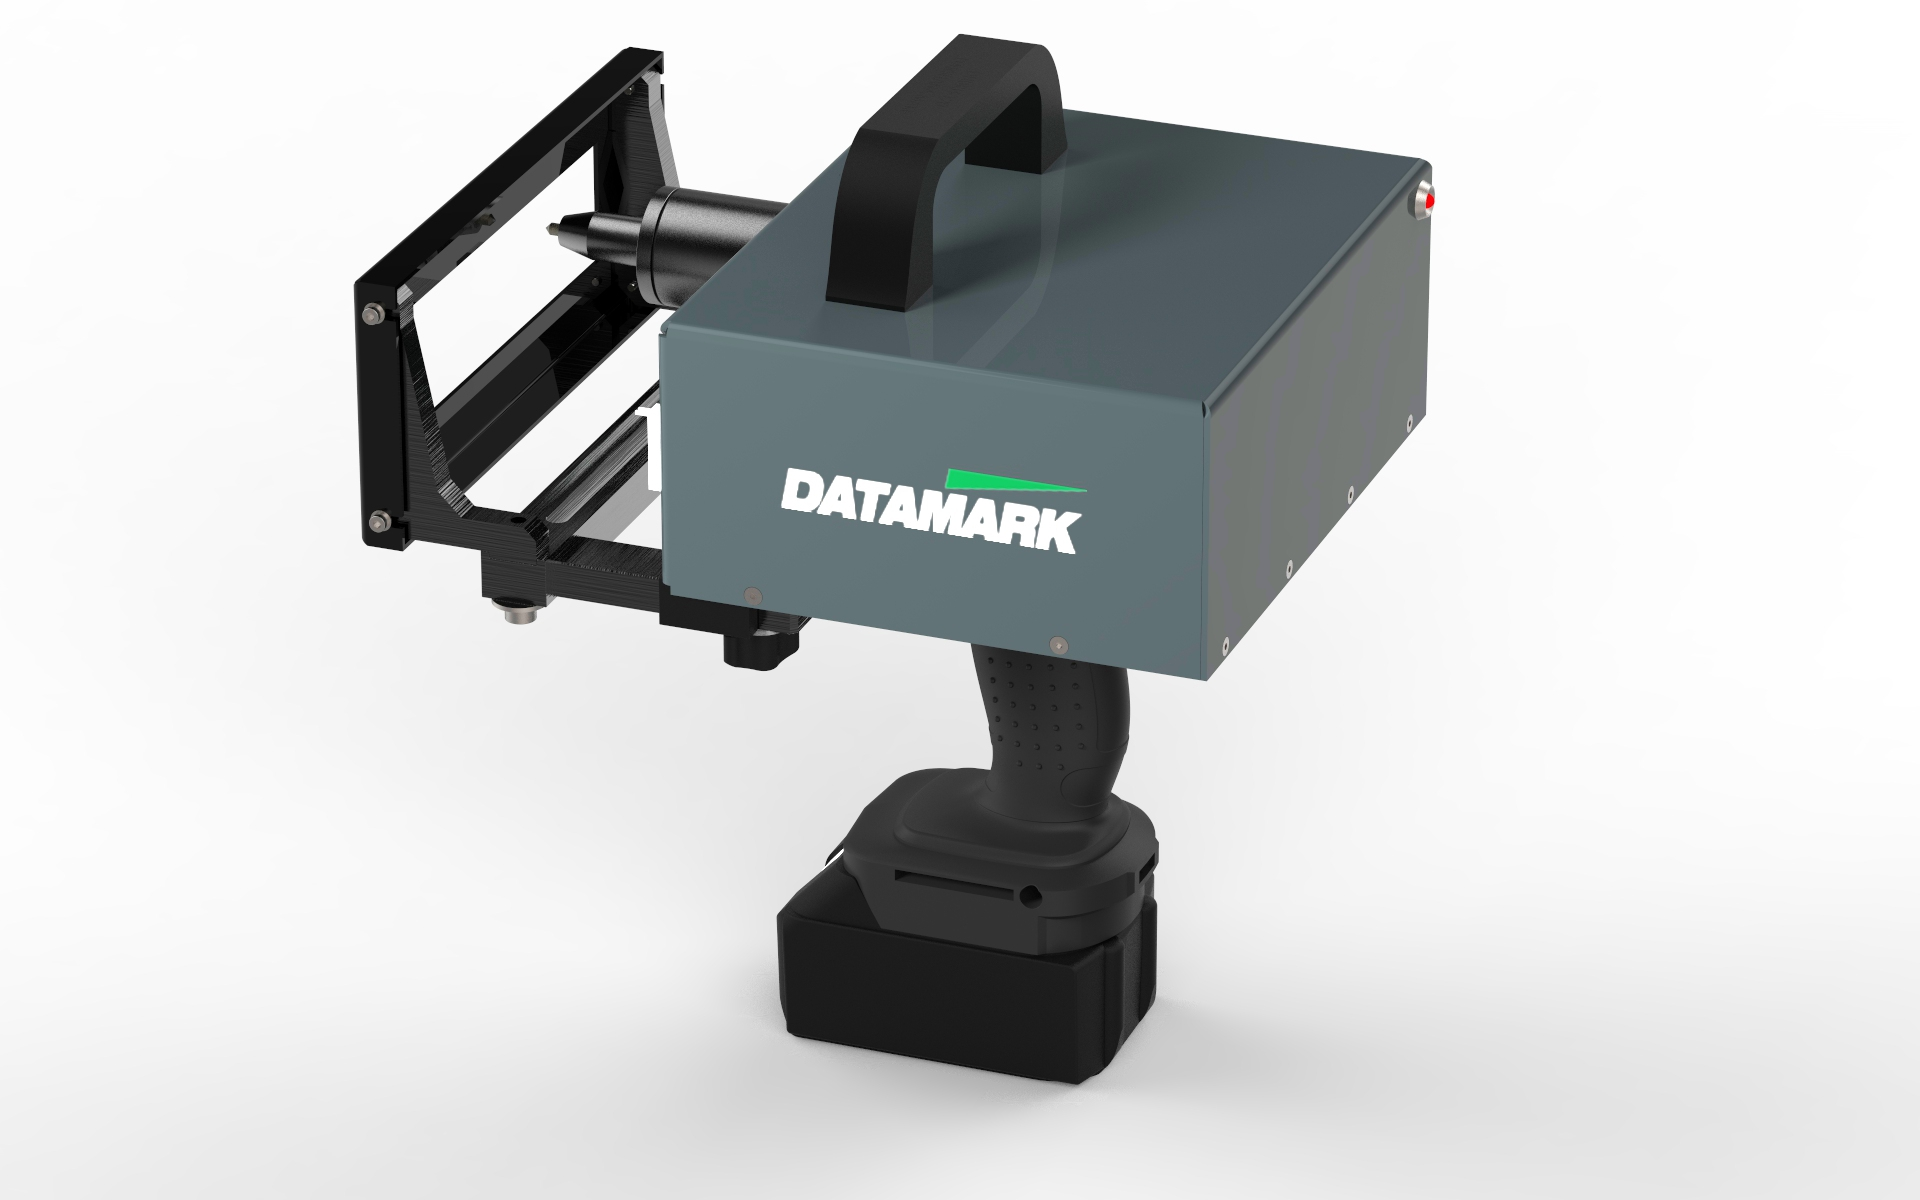 Máquina para marcar bastidores con números de identificación